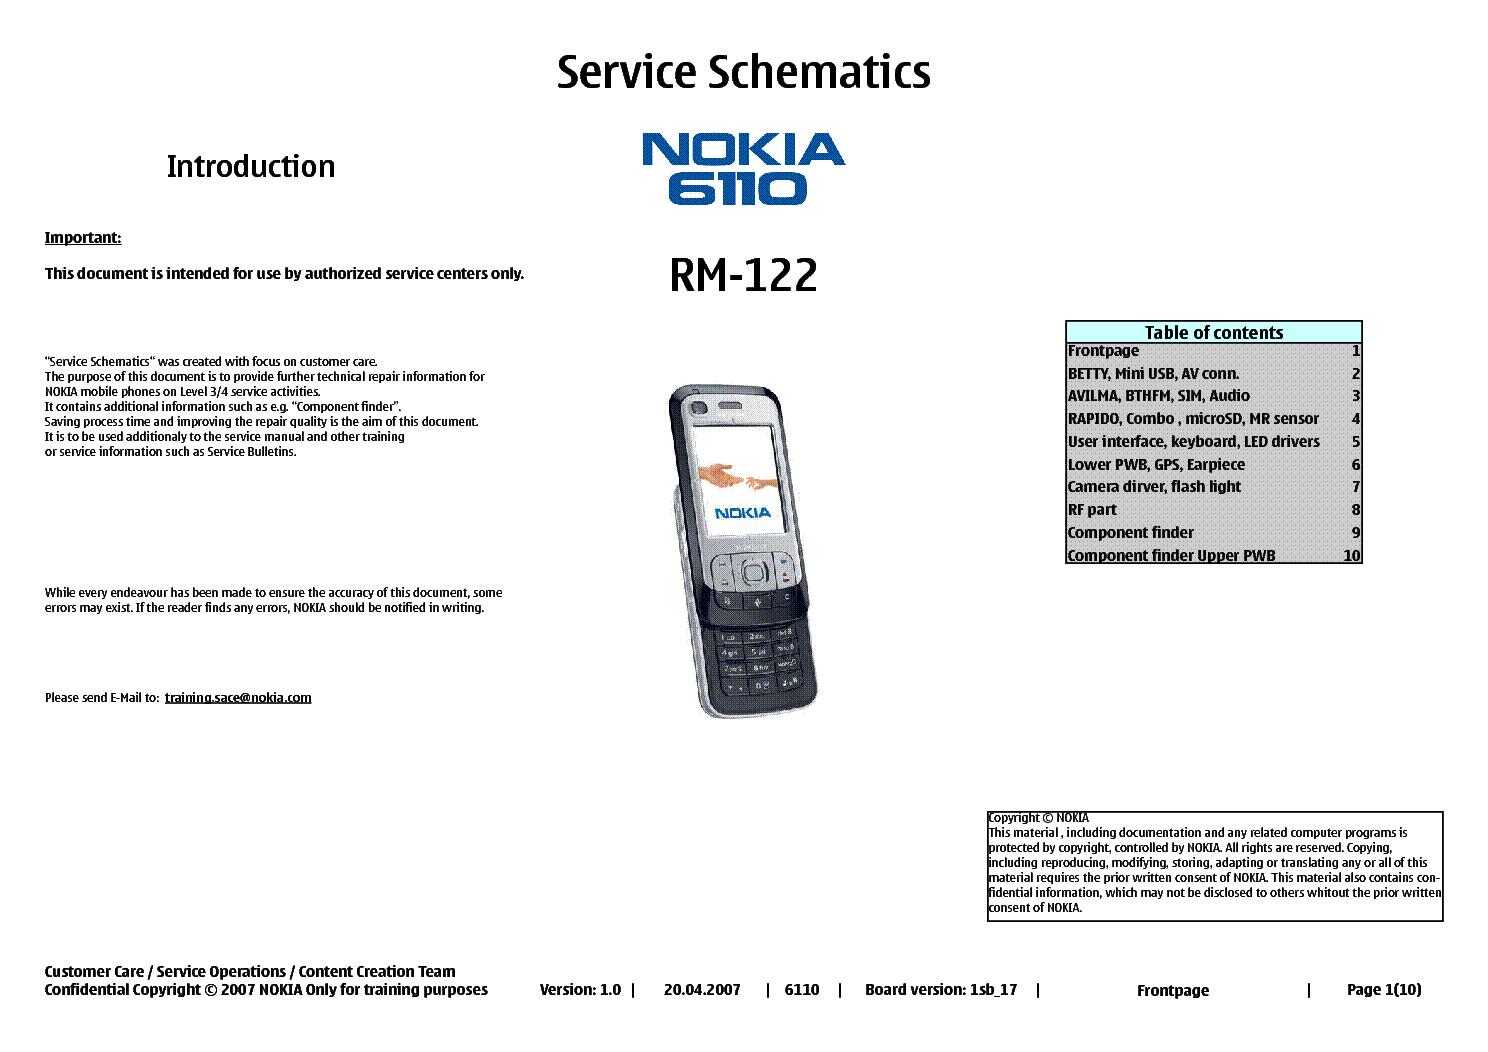 nokia 6110 rm 122 service schematics service manual download rh elektrotanya com Nokia 5110 Nokia 6210